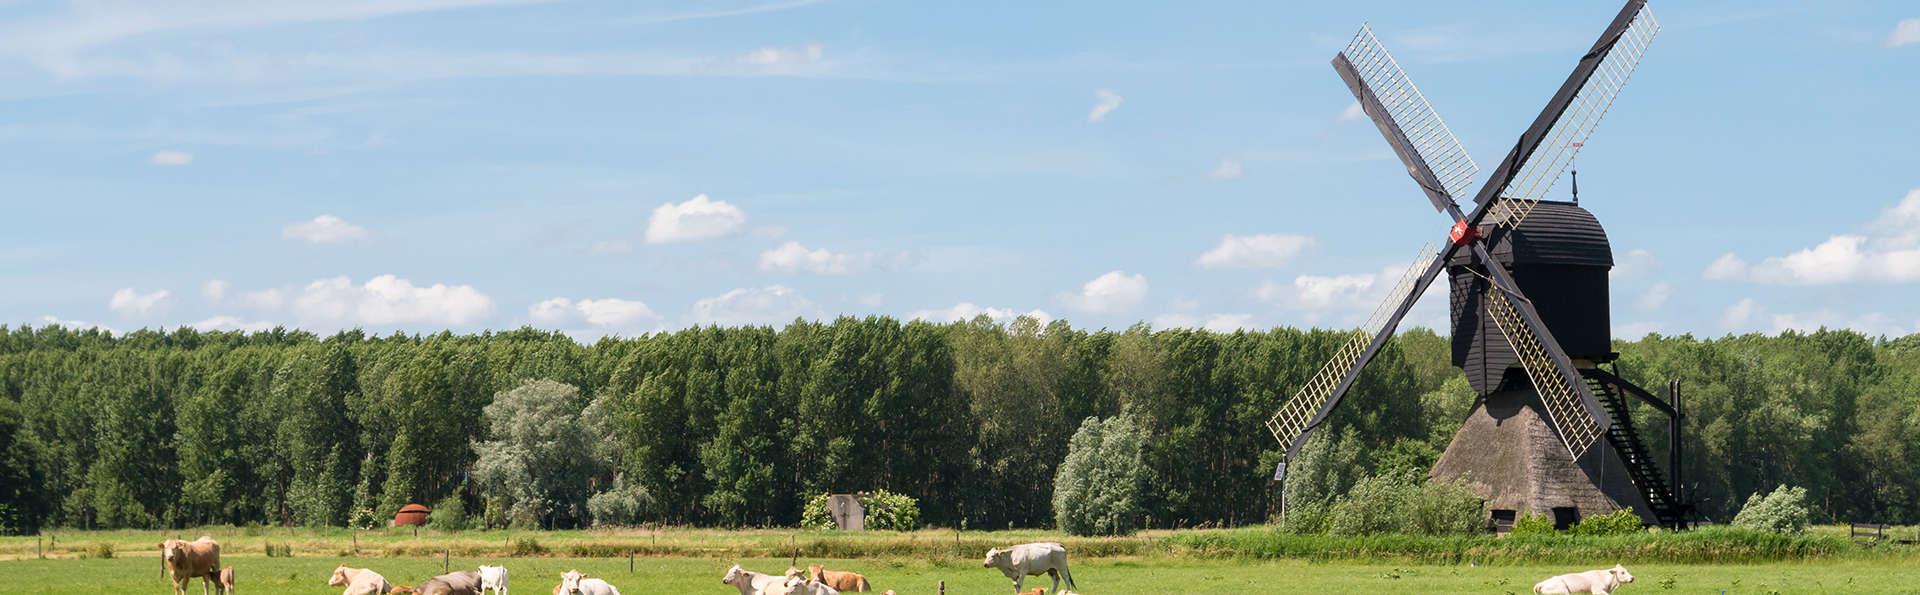 Teugel Resort Uden - Noord-Brabant.jpeg